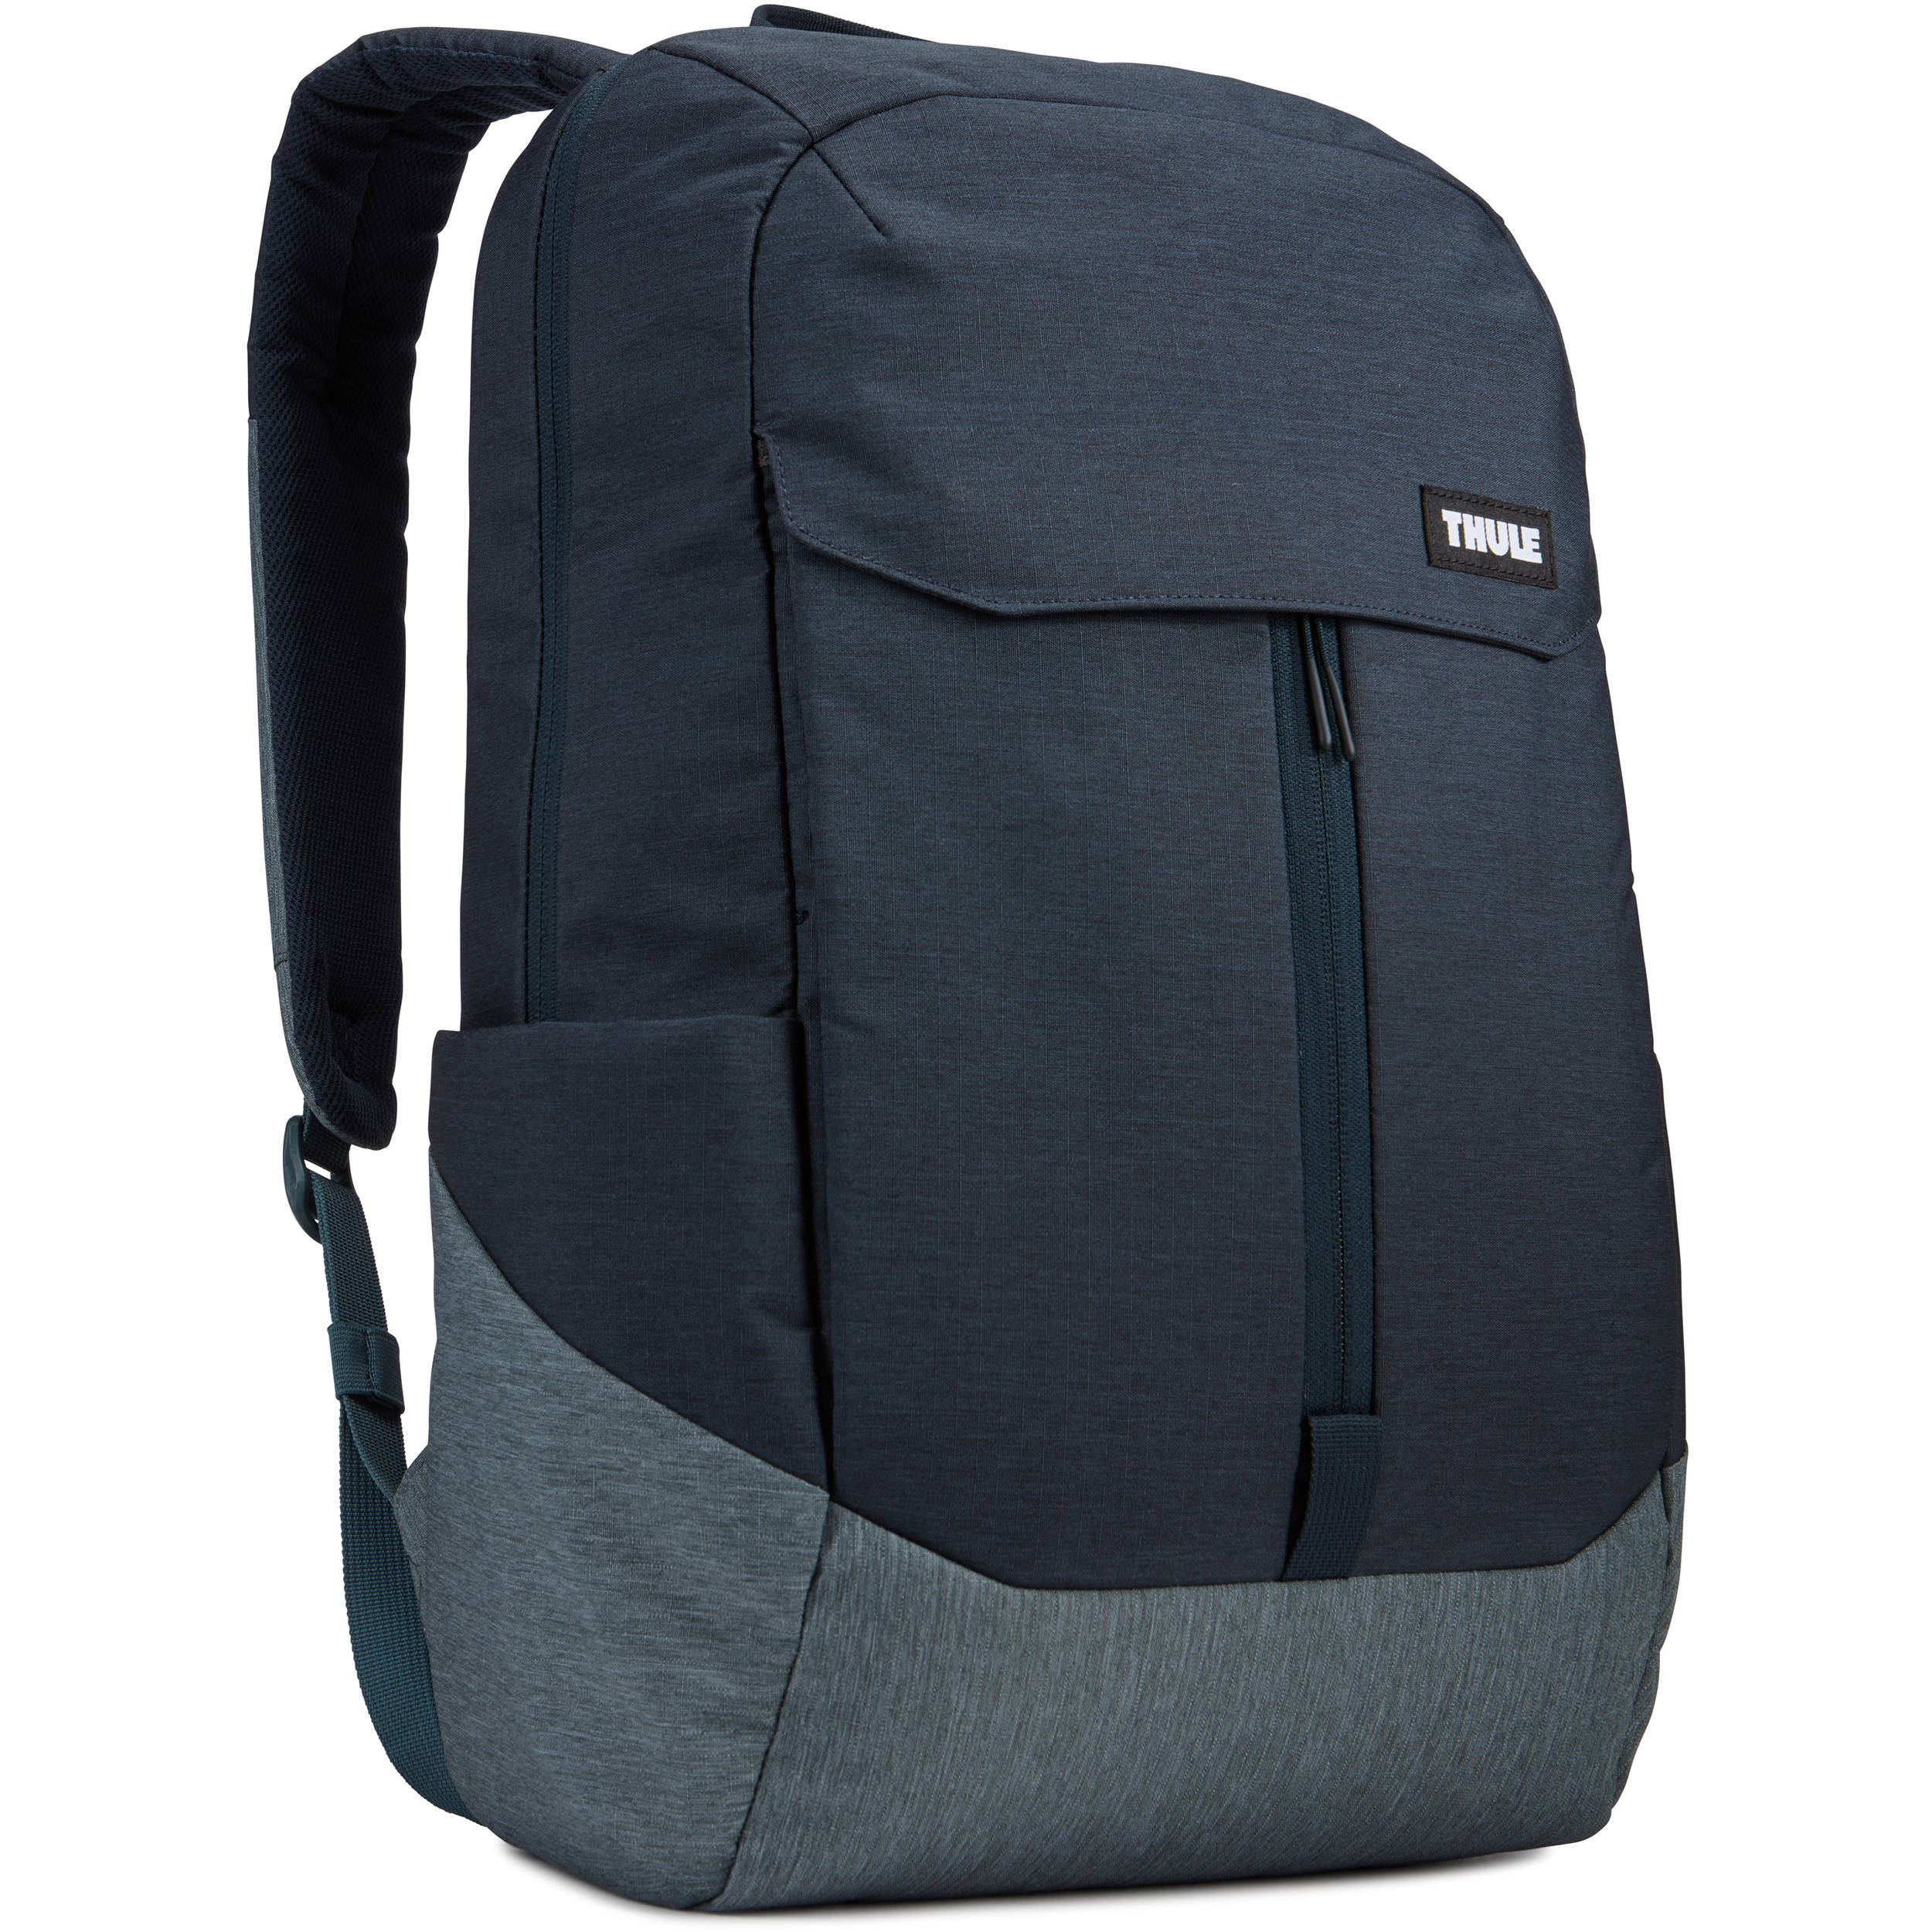 64a02fbd0778 Thule Lithos 20L Backpack (Carbon Blue) 3203635 B H Photo Video